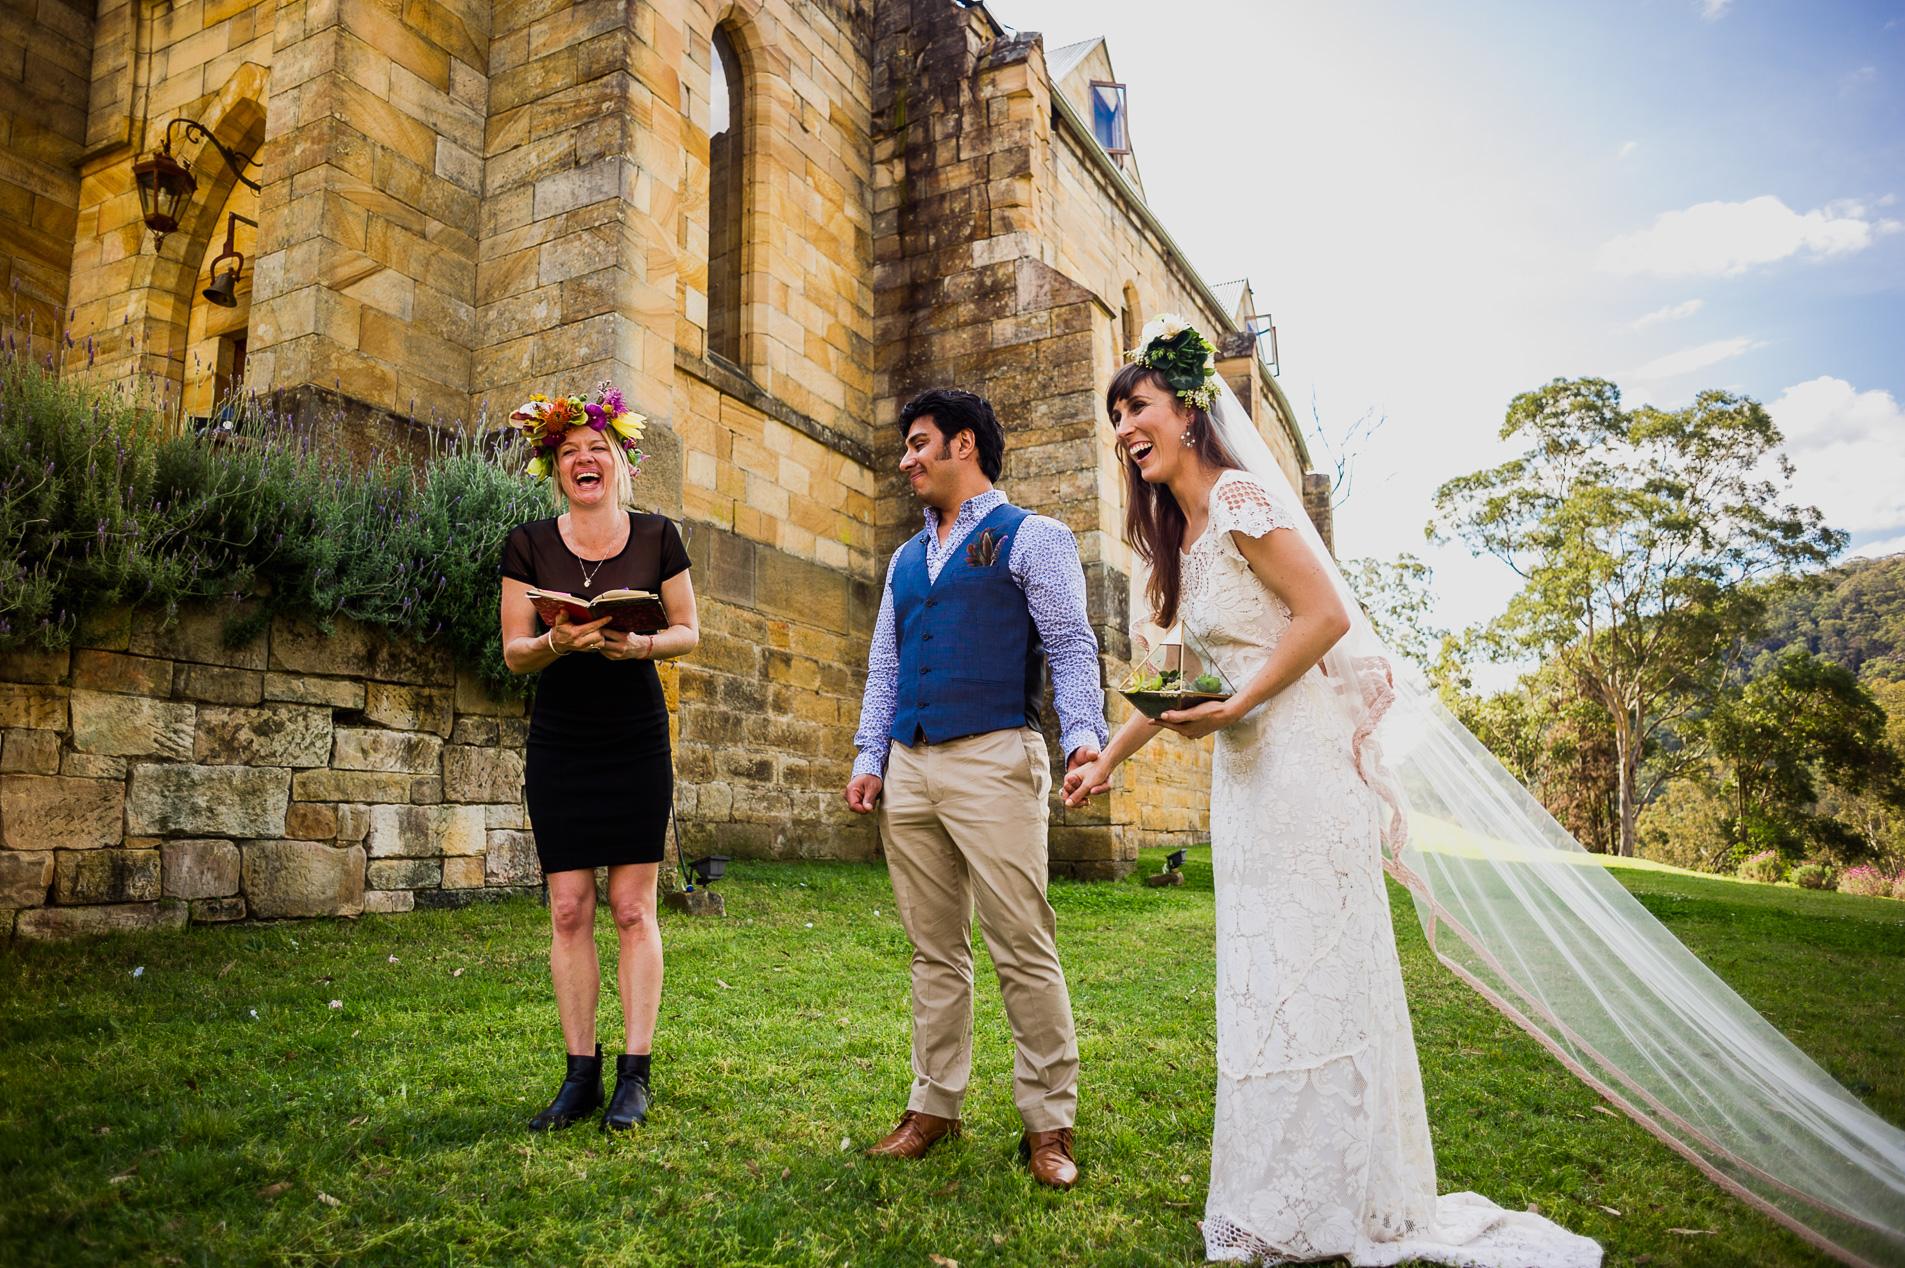 Rachel-gonzalo-wedding-sydney-32